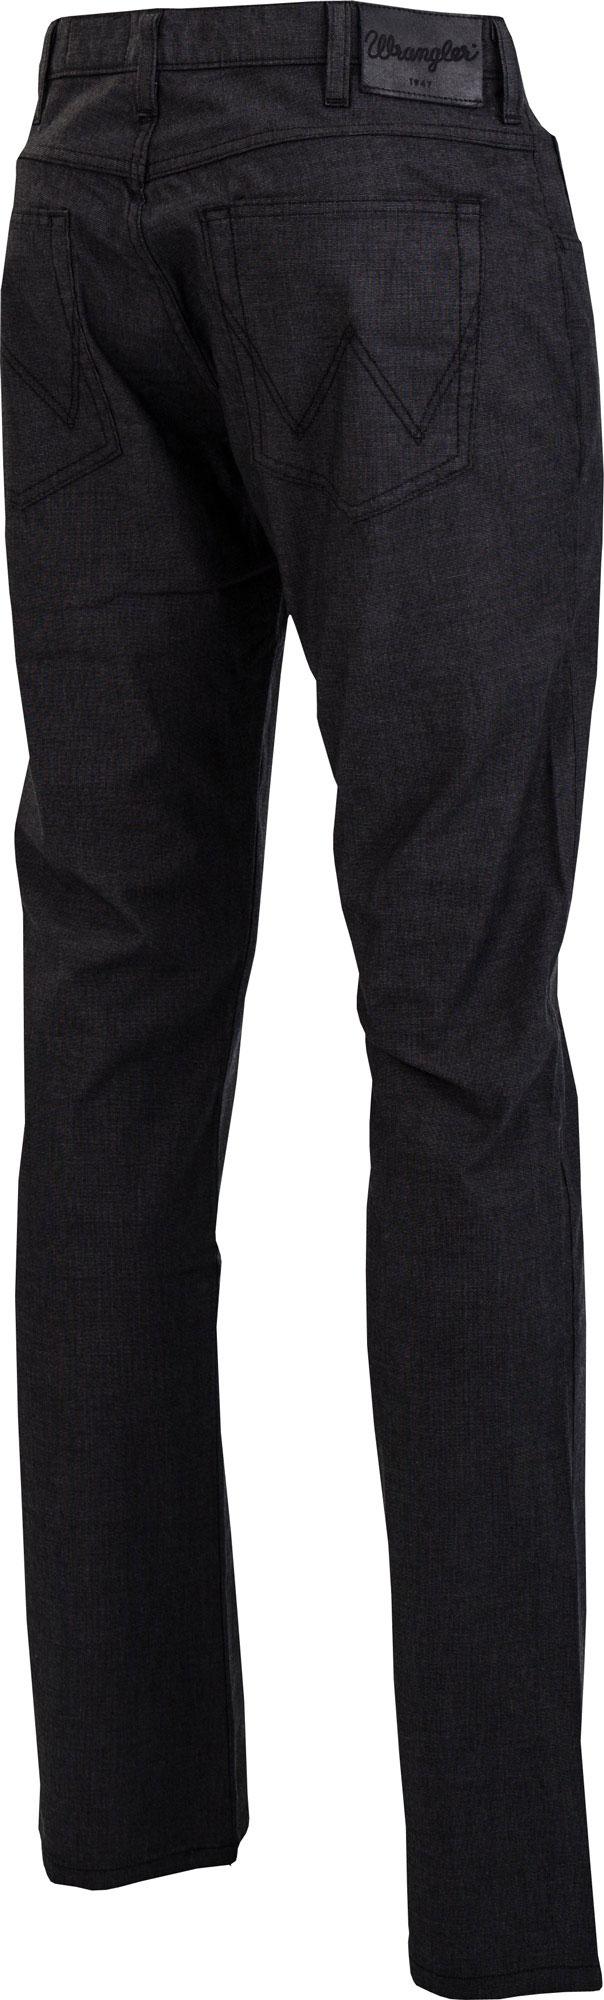 ARIZONA STRETCH BLACK - Férfi nadrág